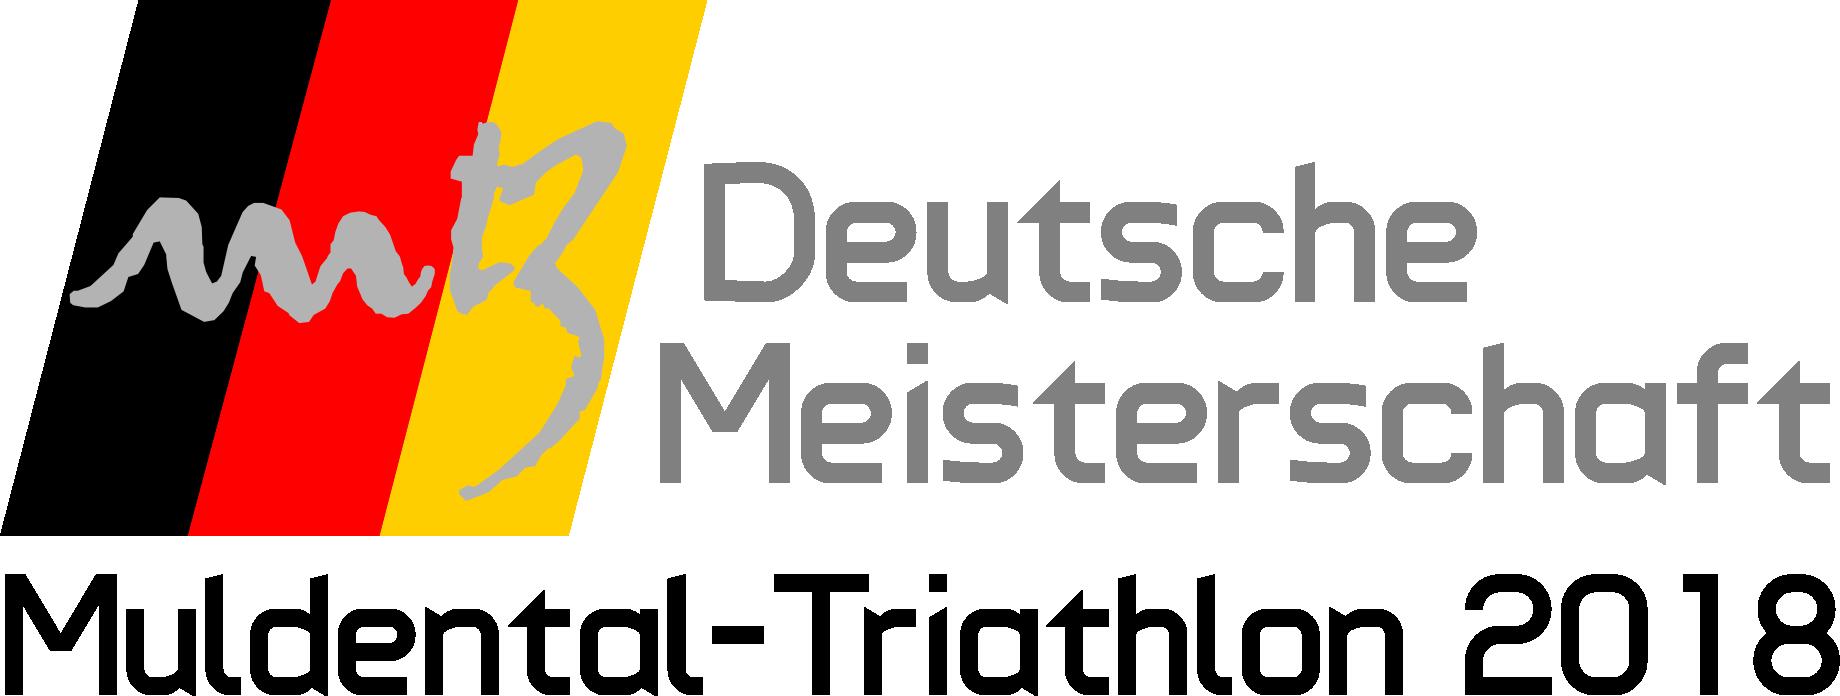 Detusche Meisterschaft 2018